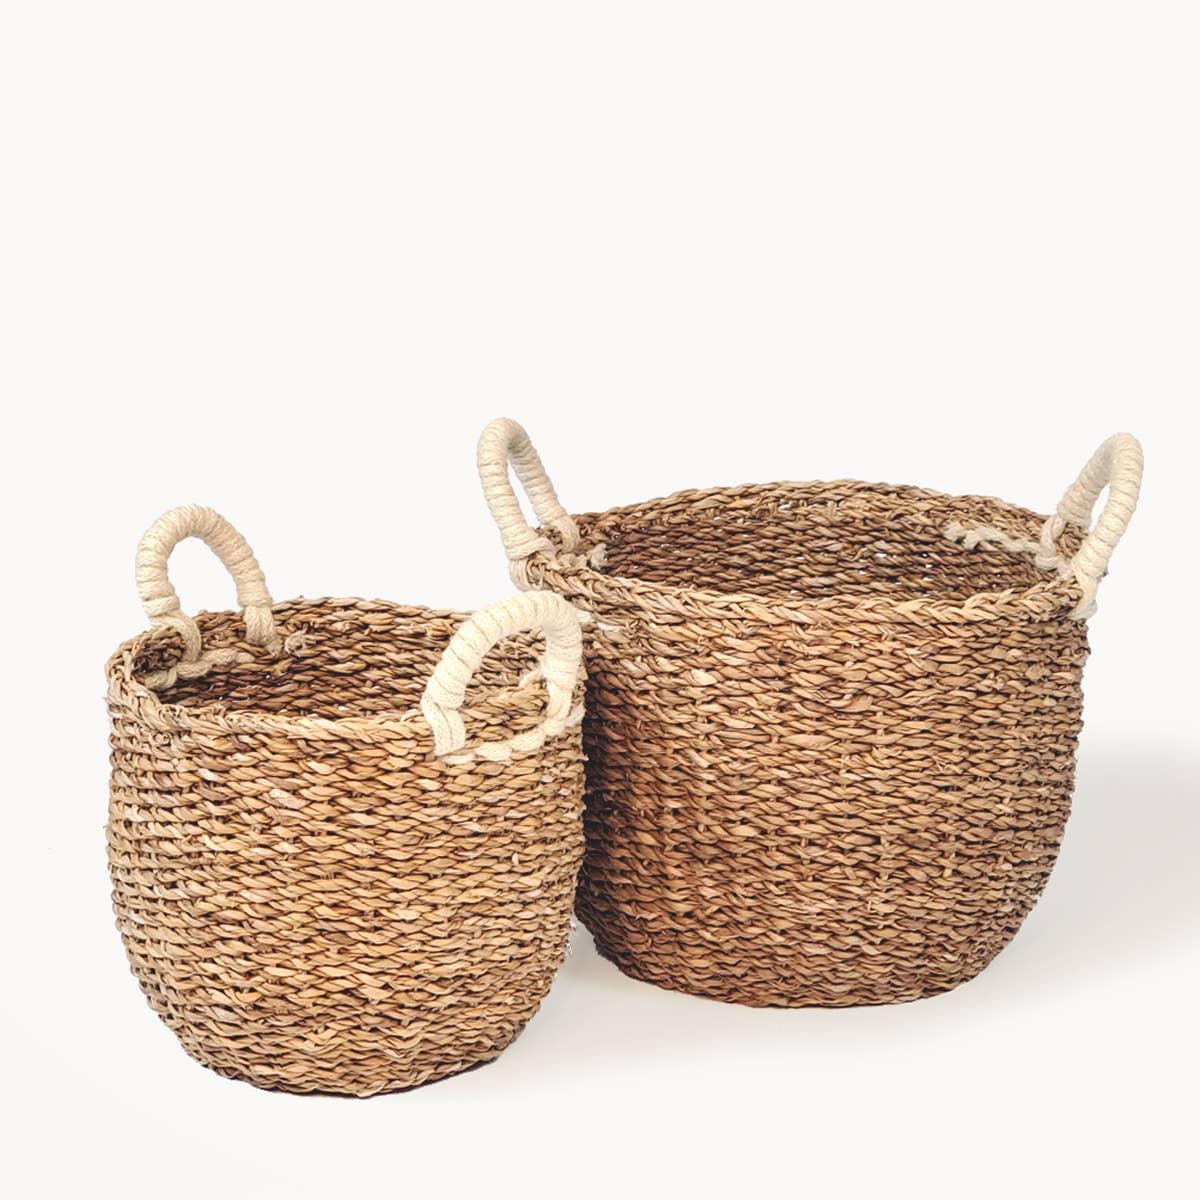 Savar Basket with White Handle (Set of 2) | Trada Marketplace